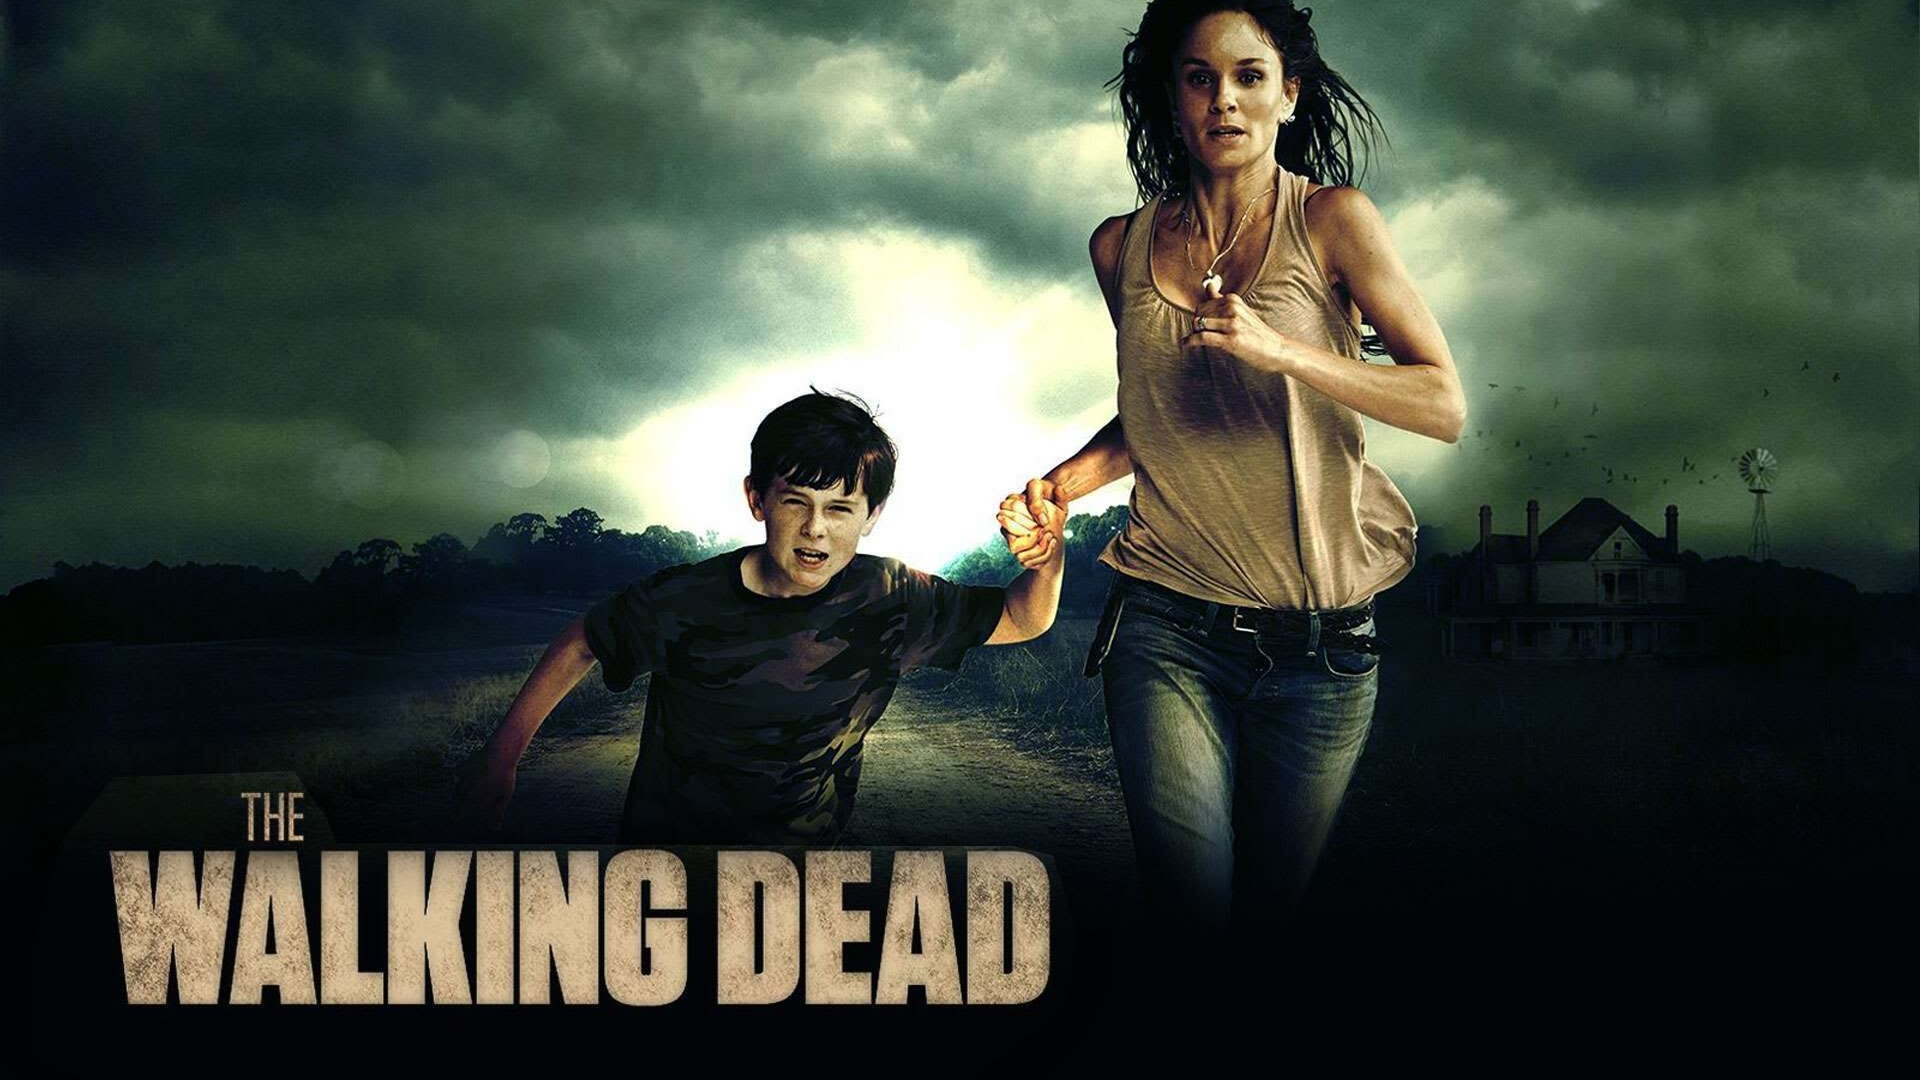 The Walking Dead American Tv Series Wallpaper 10 Preview 10wallpaper Com